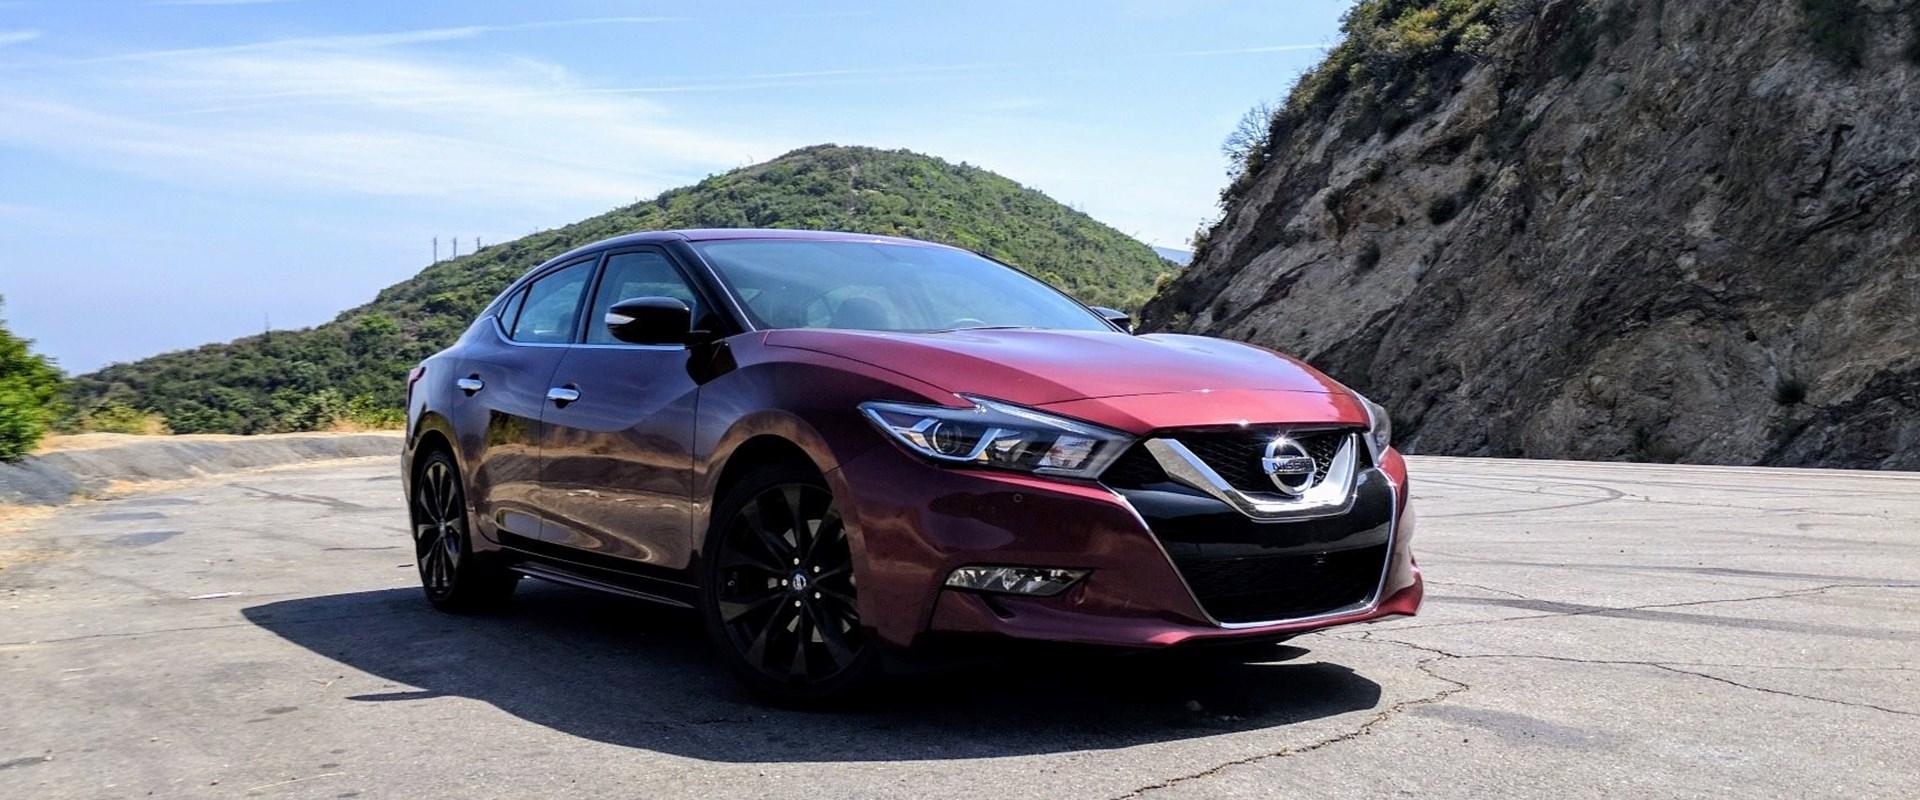 2017 Nissan Maxima Review: Almost A True Four Door Sports Car   CarBuzz